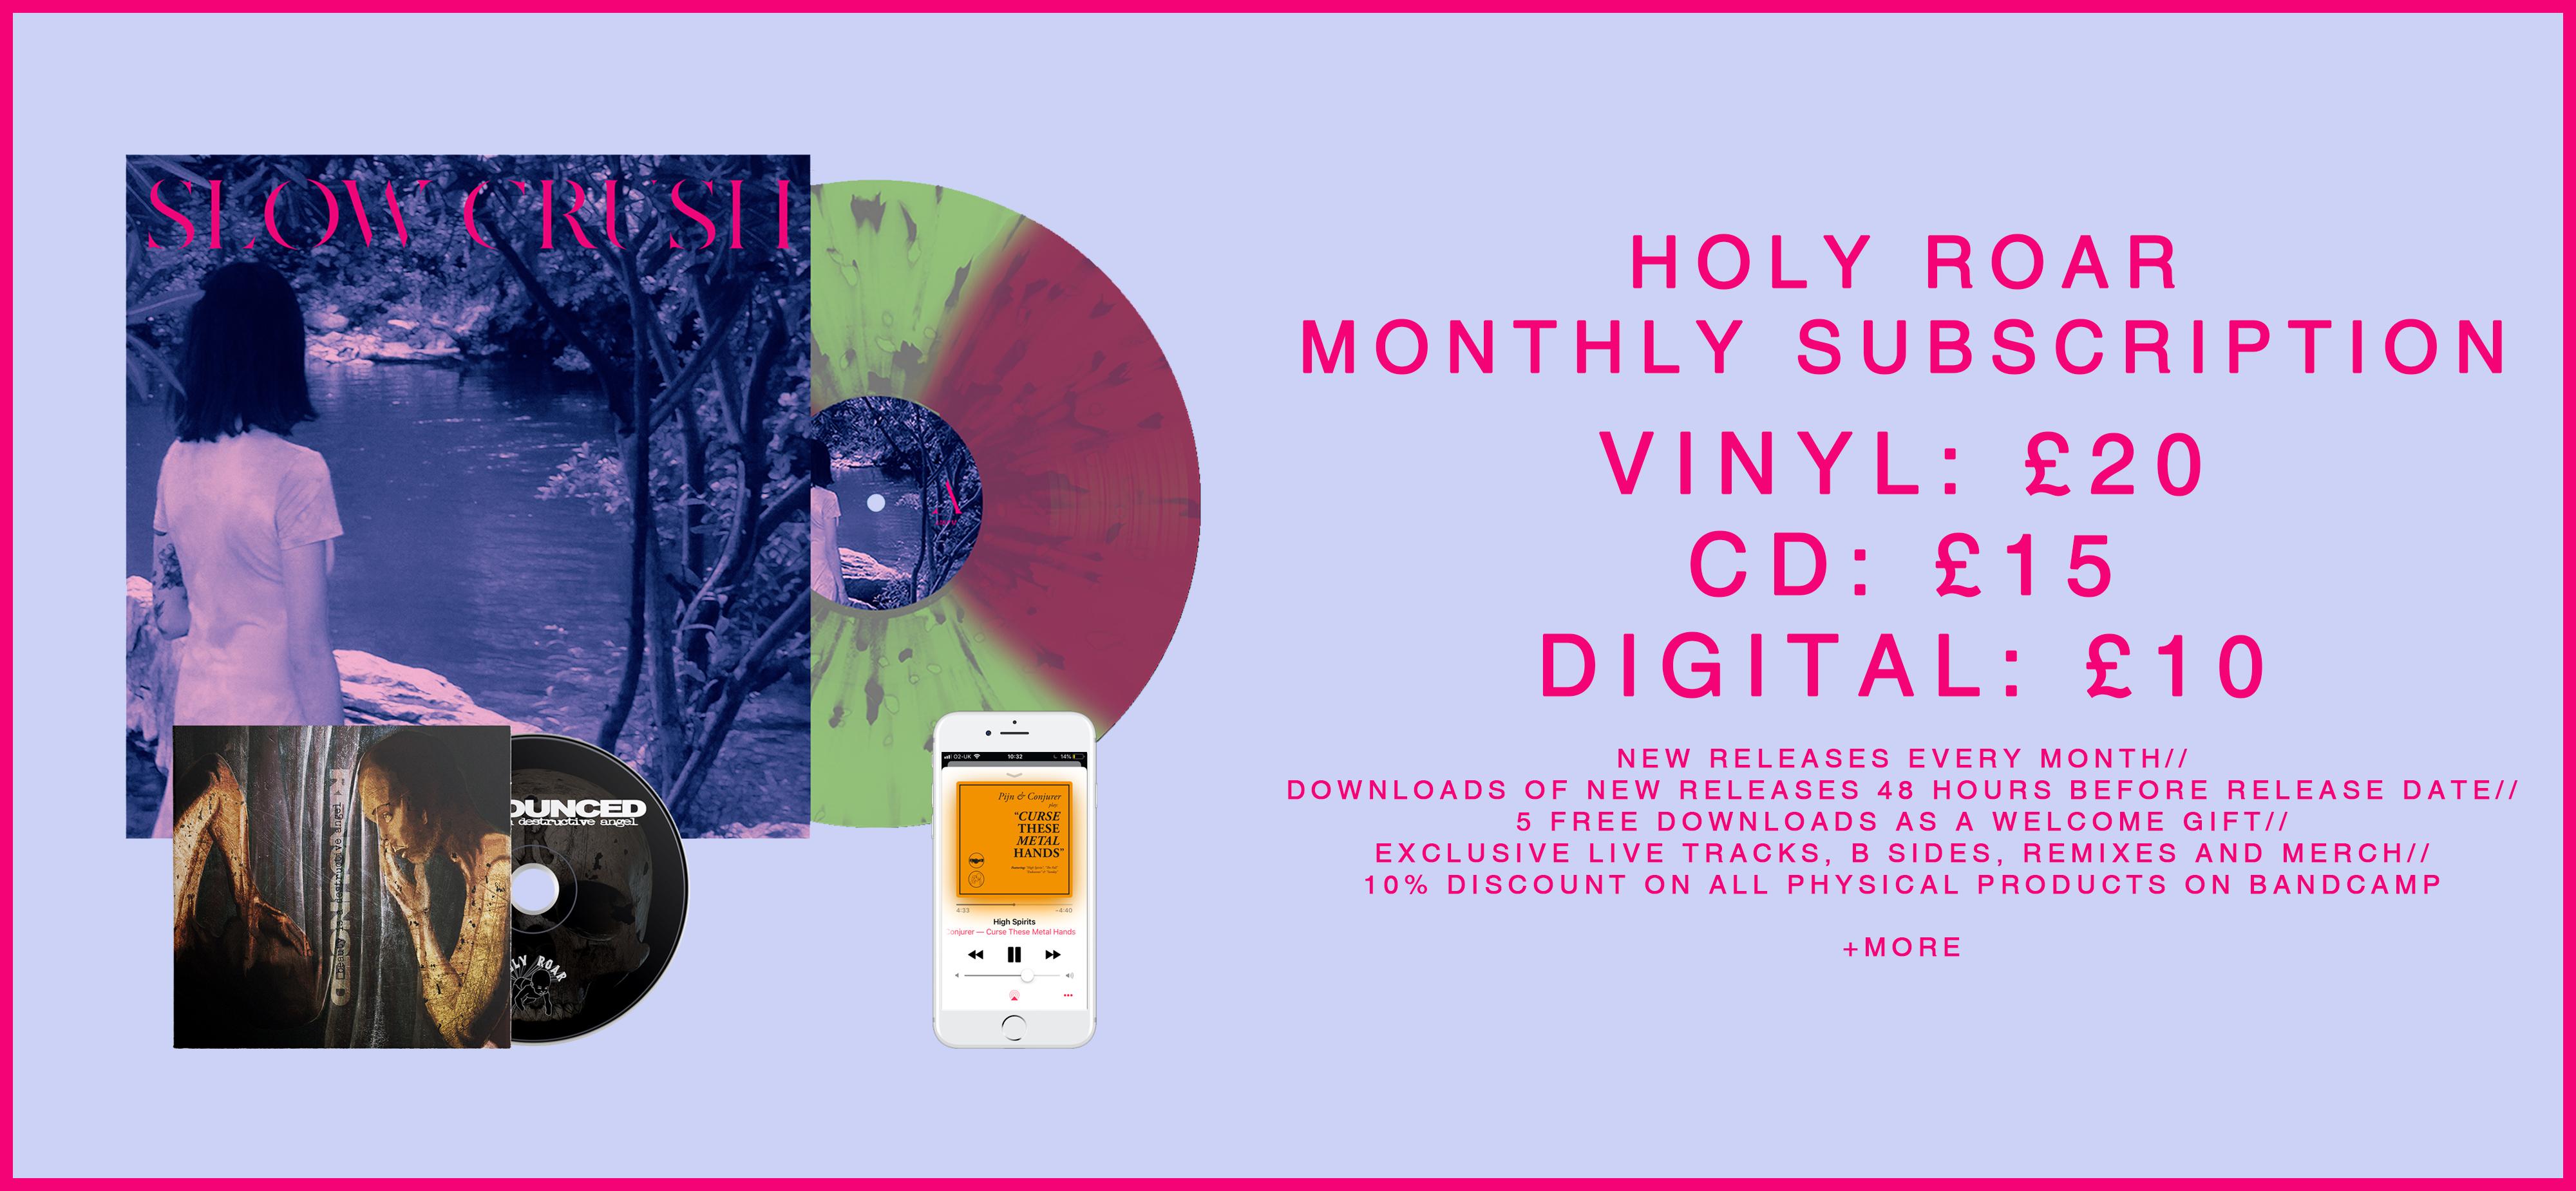 Holy Roar Records Ltd